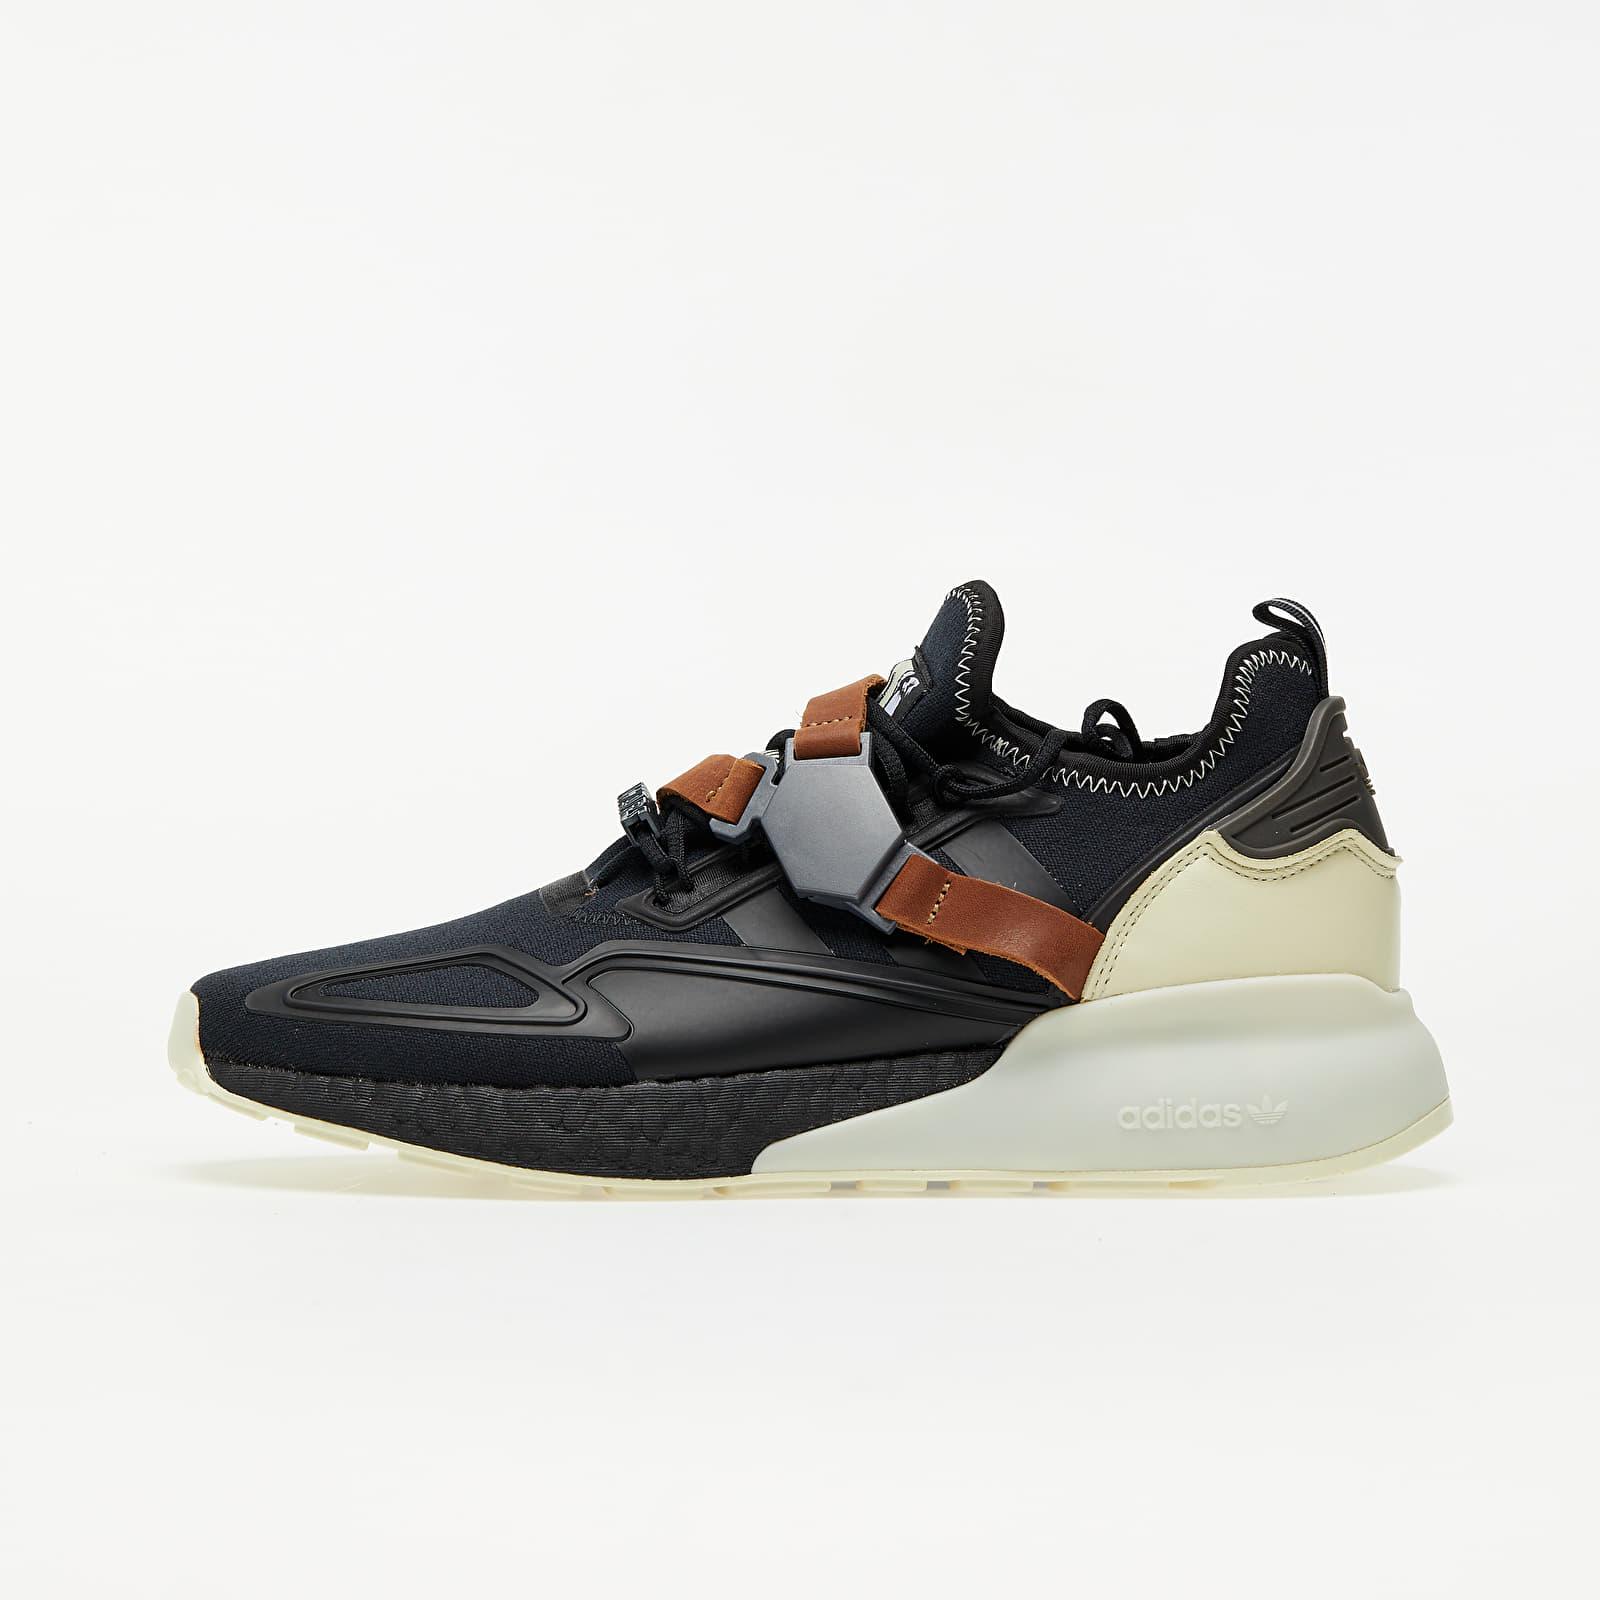 Men's shoes adidas x Star Wars ZX 2K Boost Core Black/ Core Black/ Sand